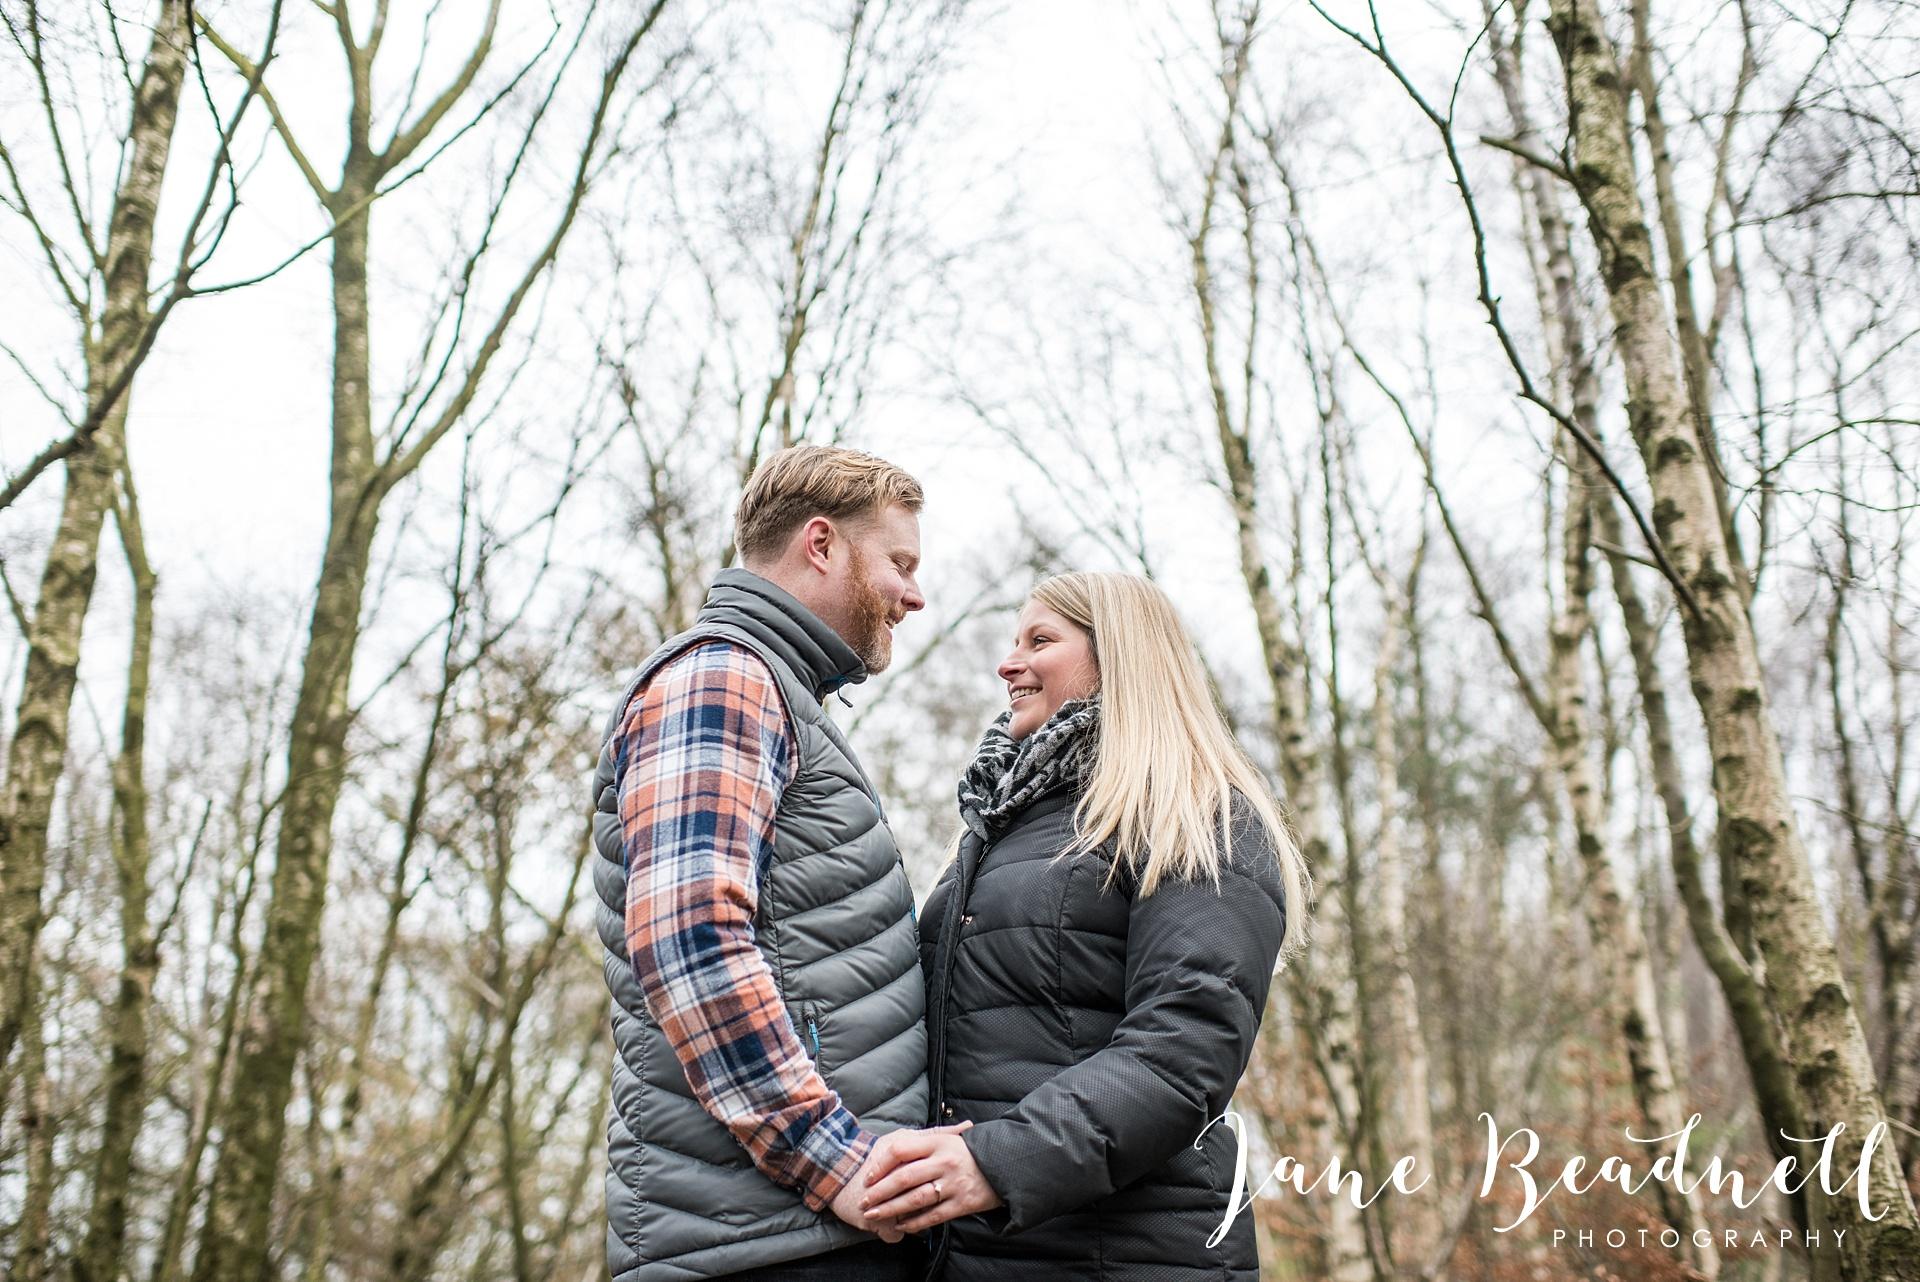 yorkshire-wedding-photographer-jane-beadnell-photography-uk-and-destination-wedding-photographer-engagement-shoot_0015